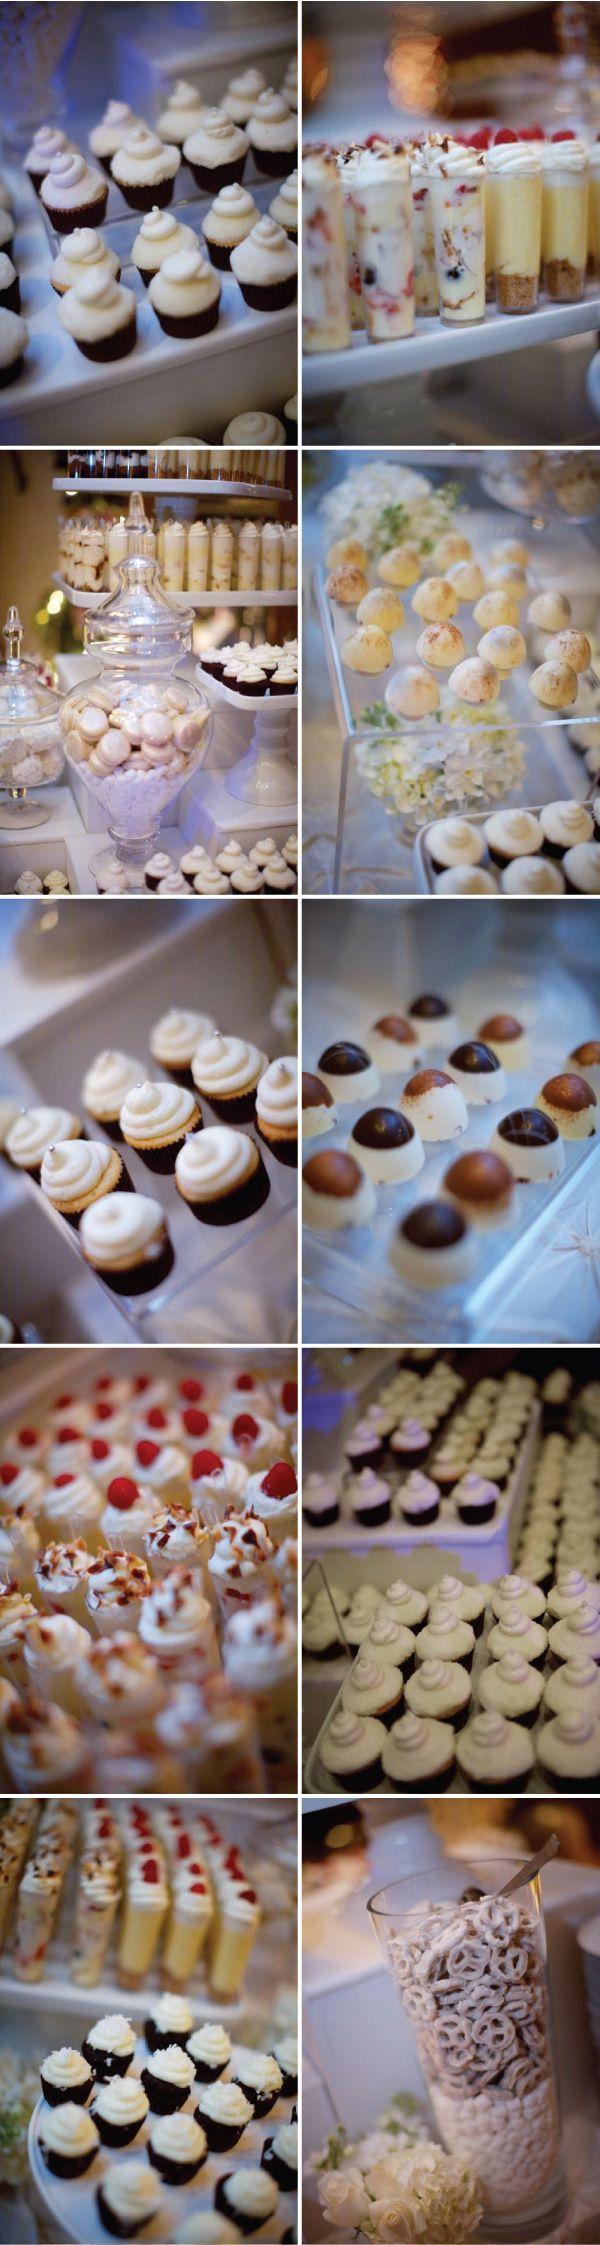 LOVE the idea of colored yogurt pretzels for table desserts